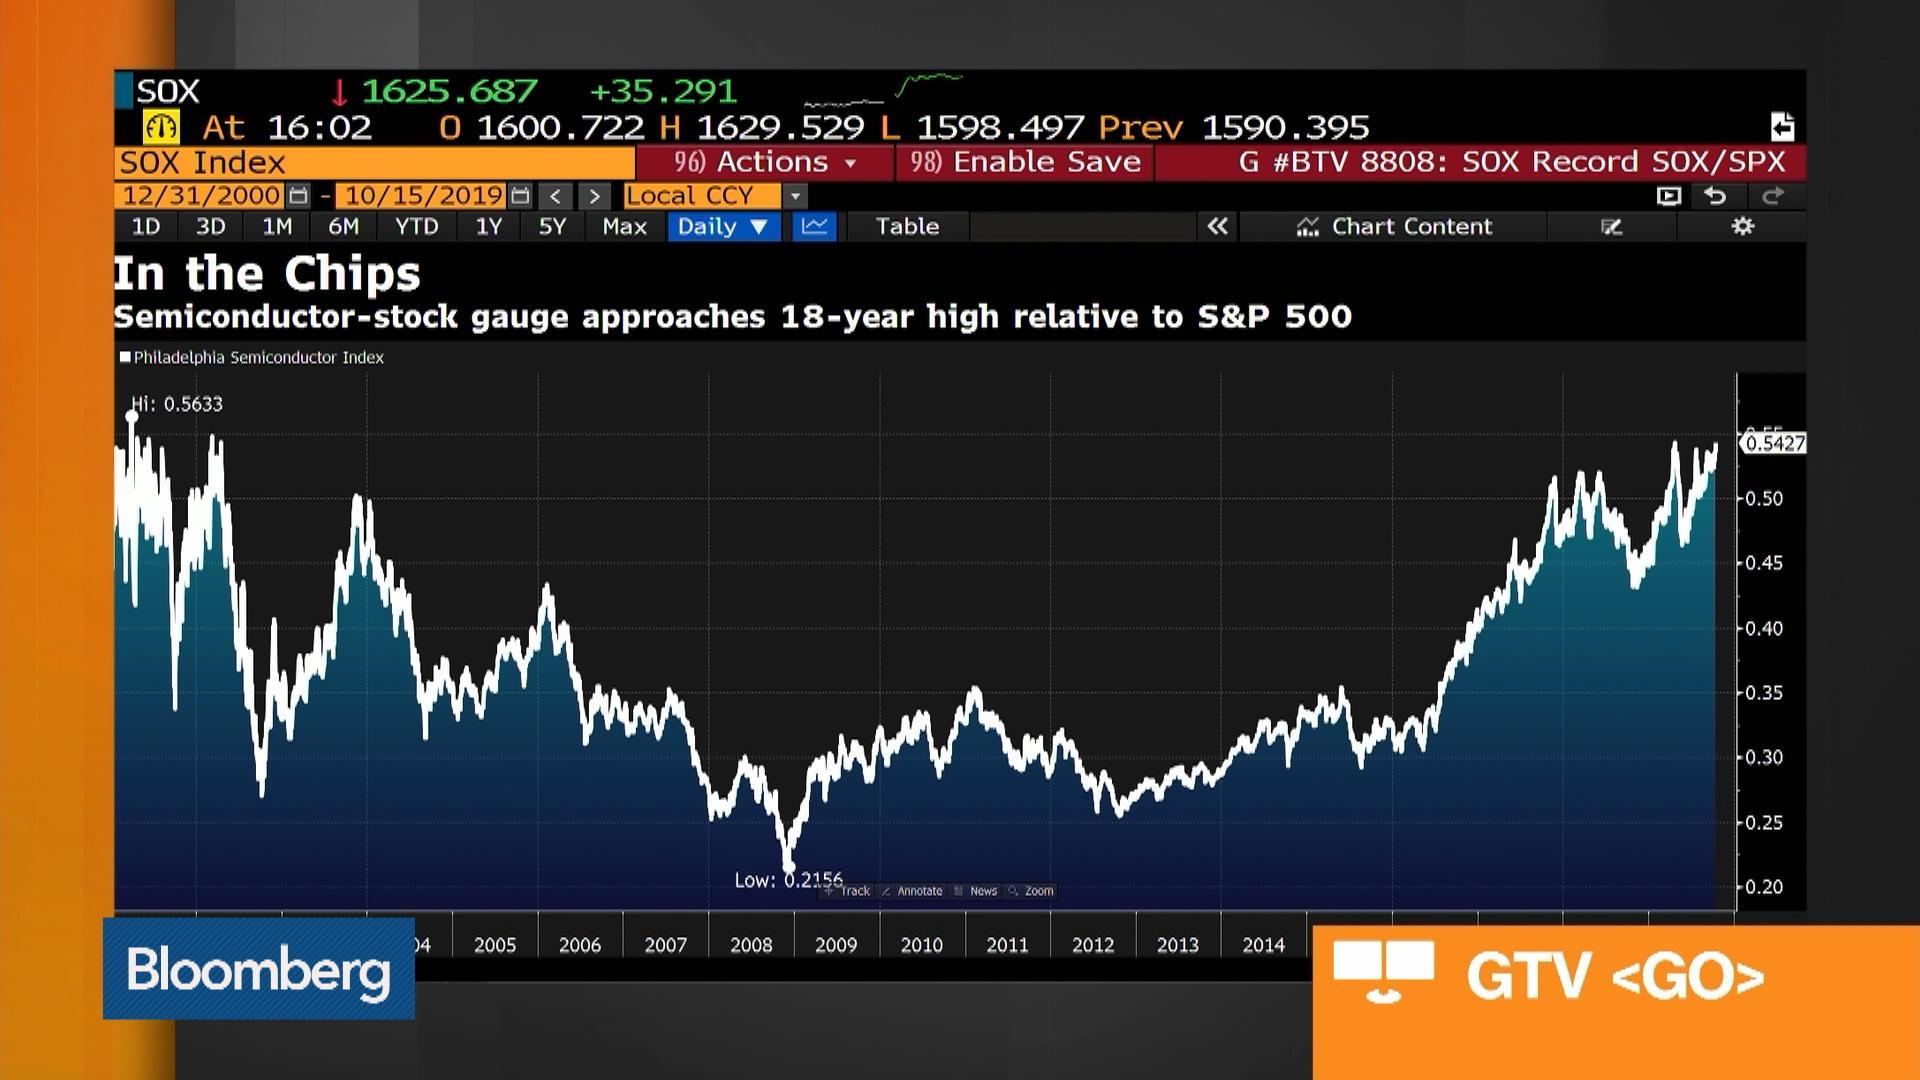 S&P 500 Bulls, Chip Stocks, Bloomin' Brands: Market Wrap